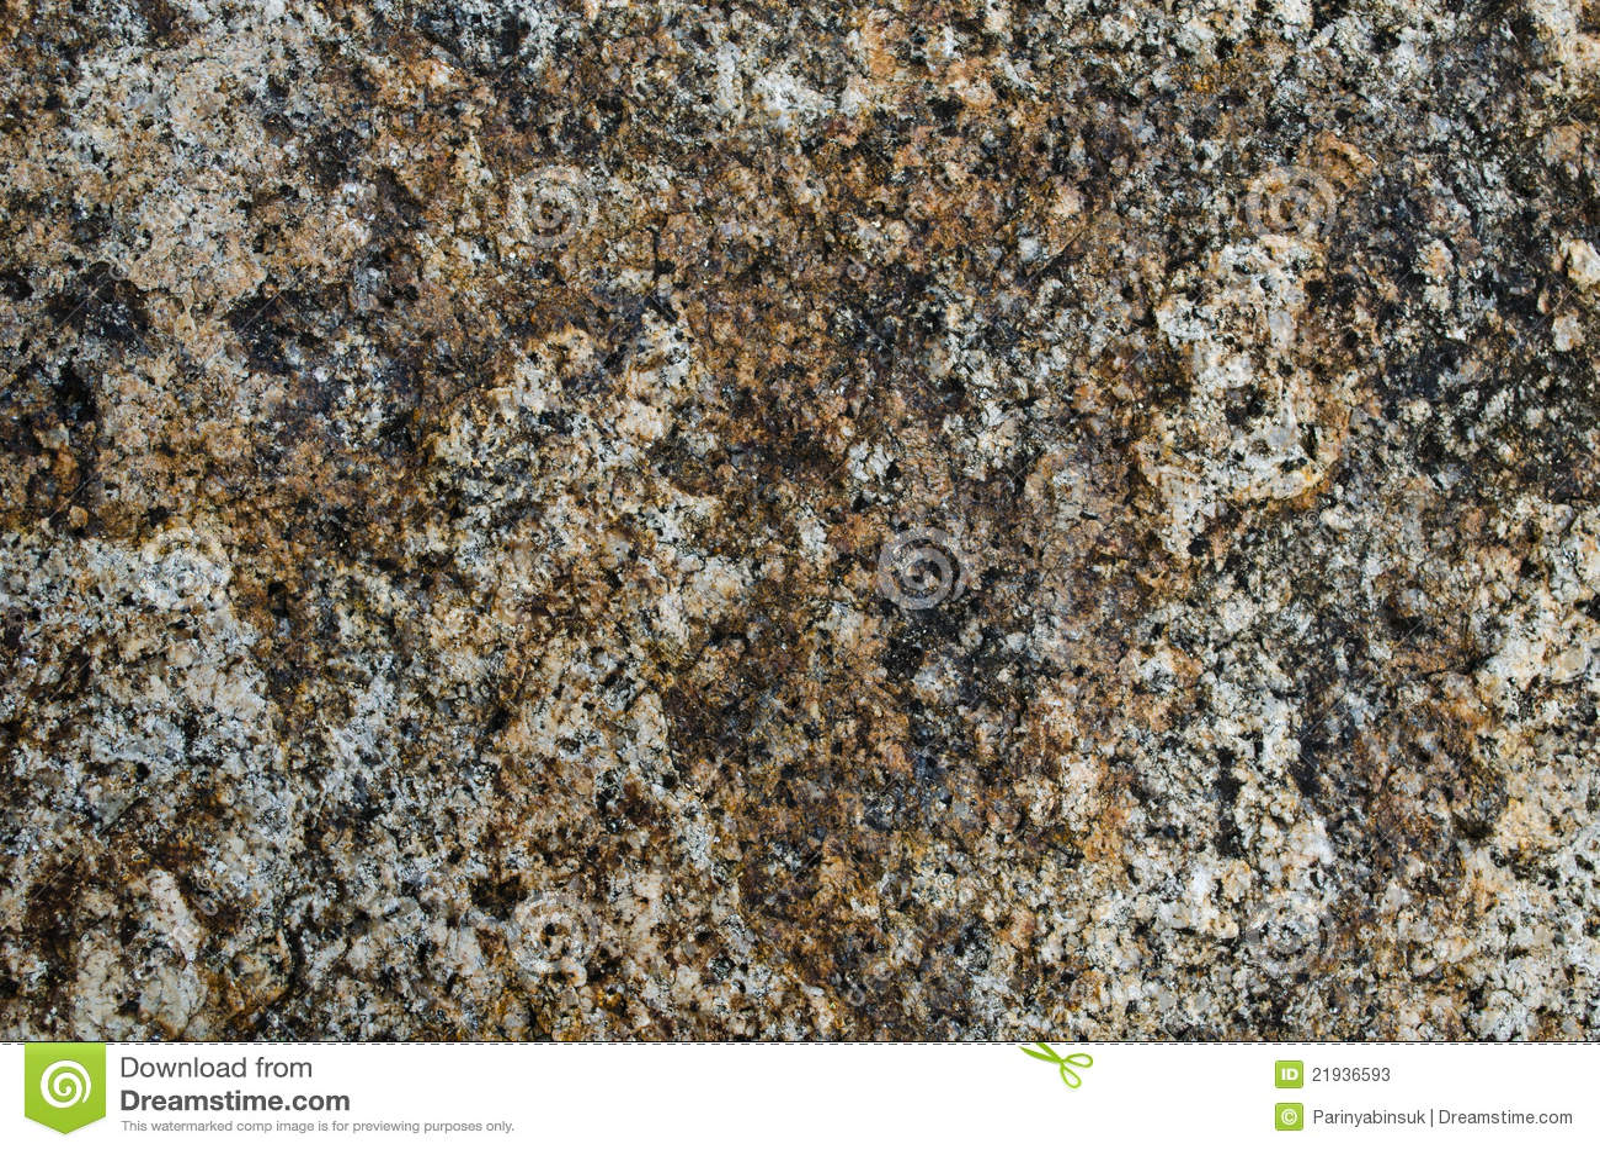 Rough Granite Stone : Rough granite stone surface stock photos image